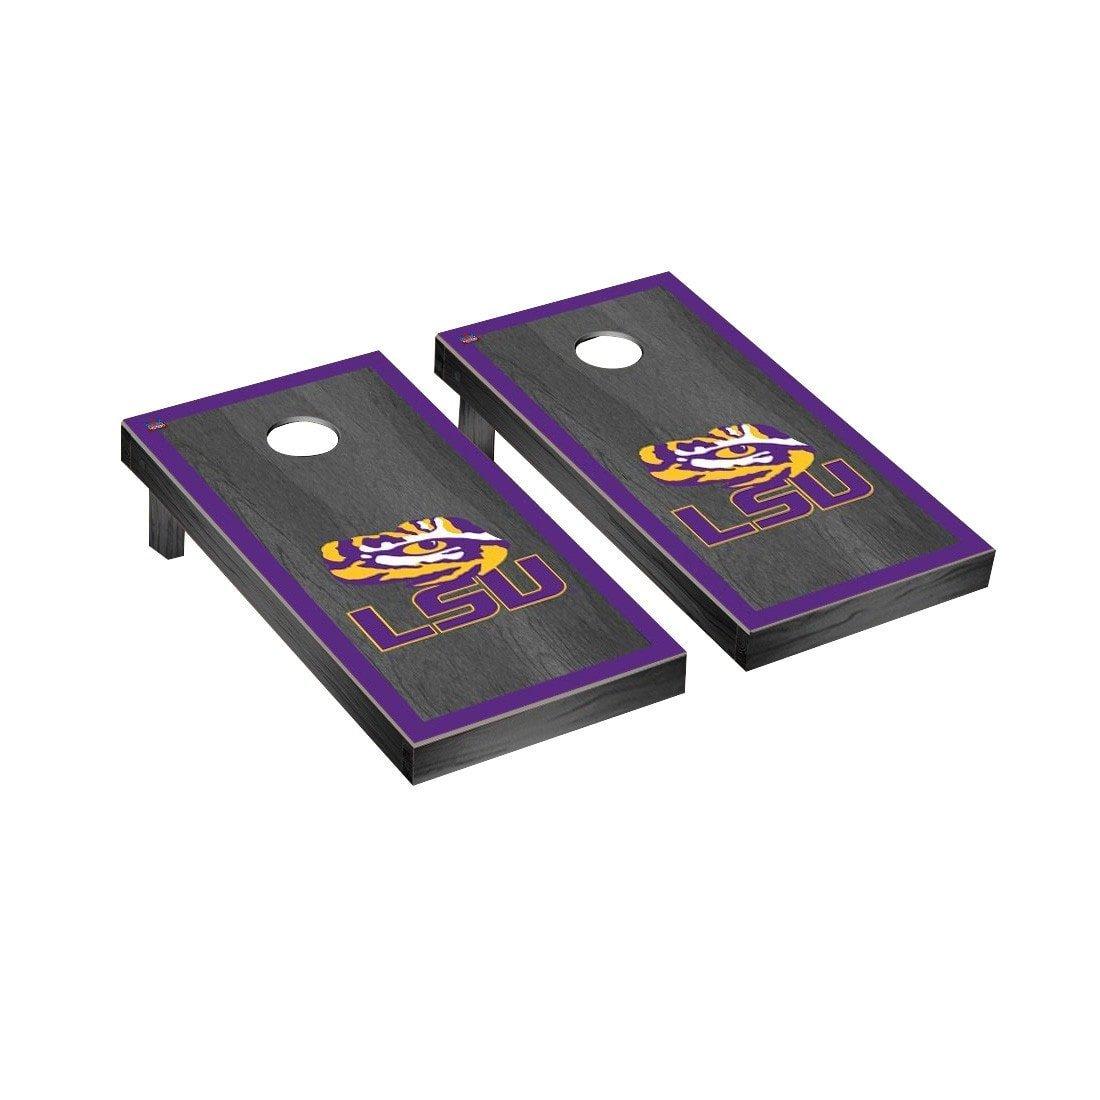 Victory Tailgate Louisiana State LSU Tigers Regulation Cornhole Game Set Onyx Stained Border Version